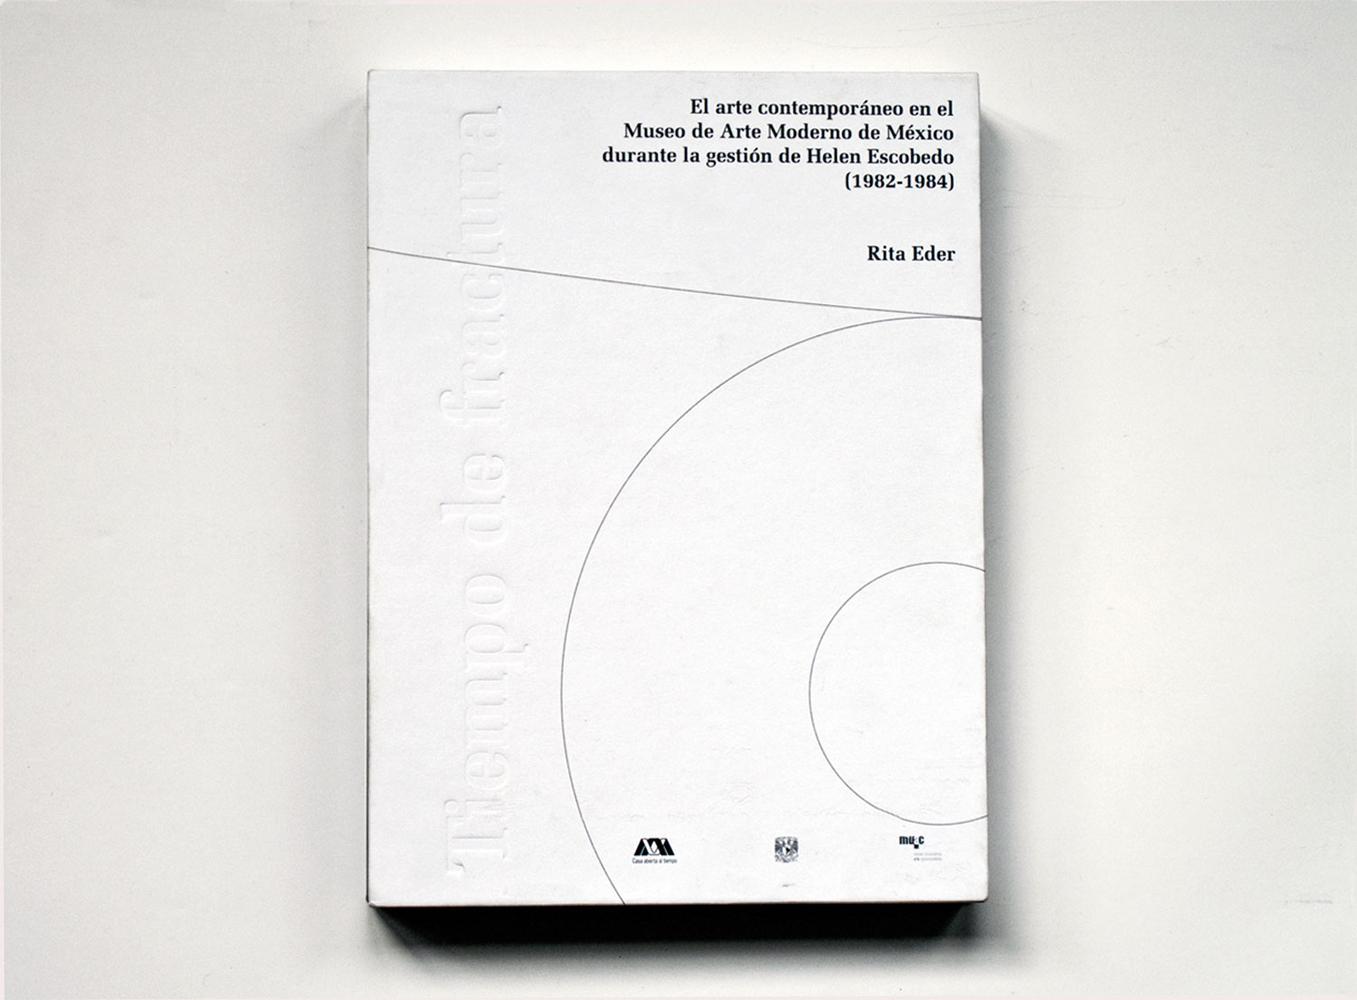 grobetximena-tiempofractura-img-011.jpg